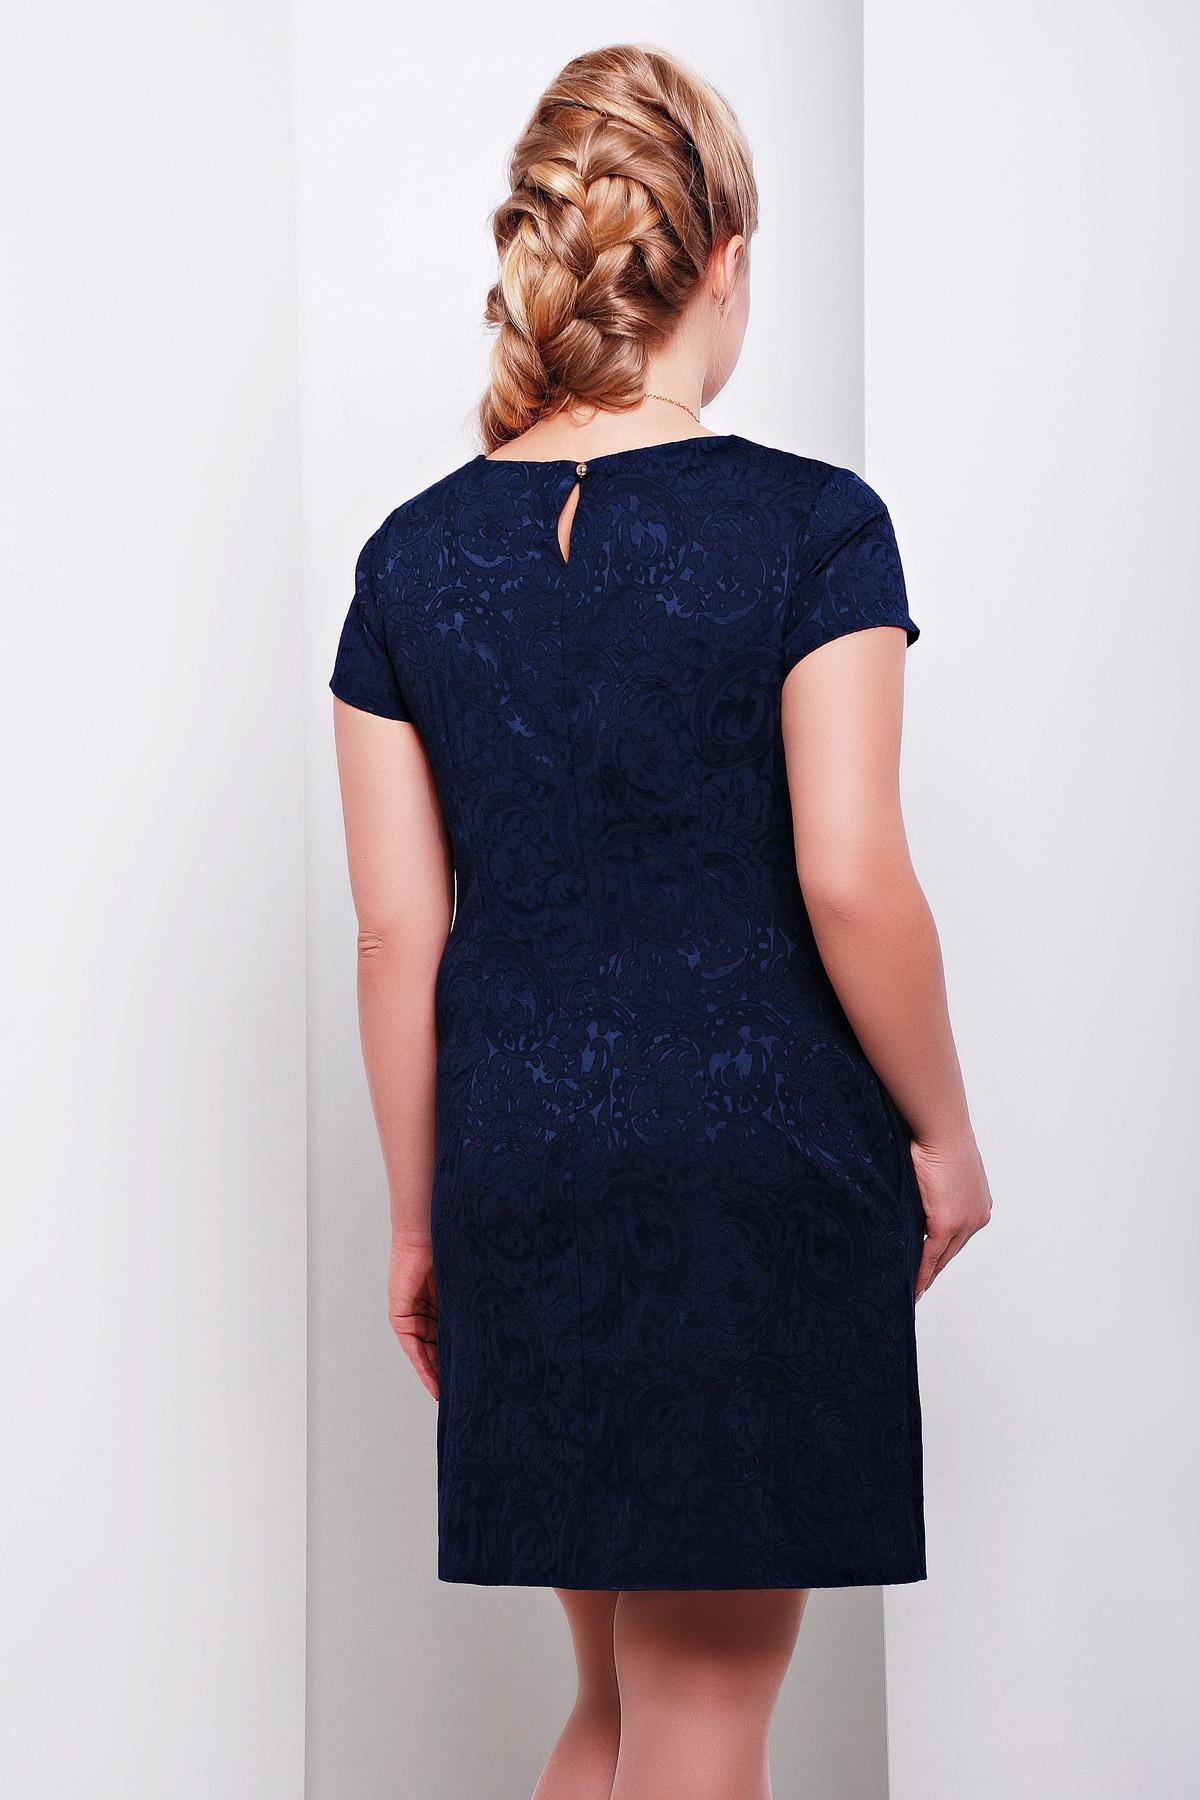 ac4ae99ab98 платье Миранда-Б к р. Цвет  веер-электрик